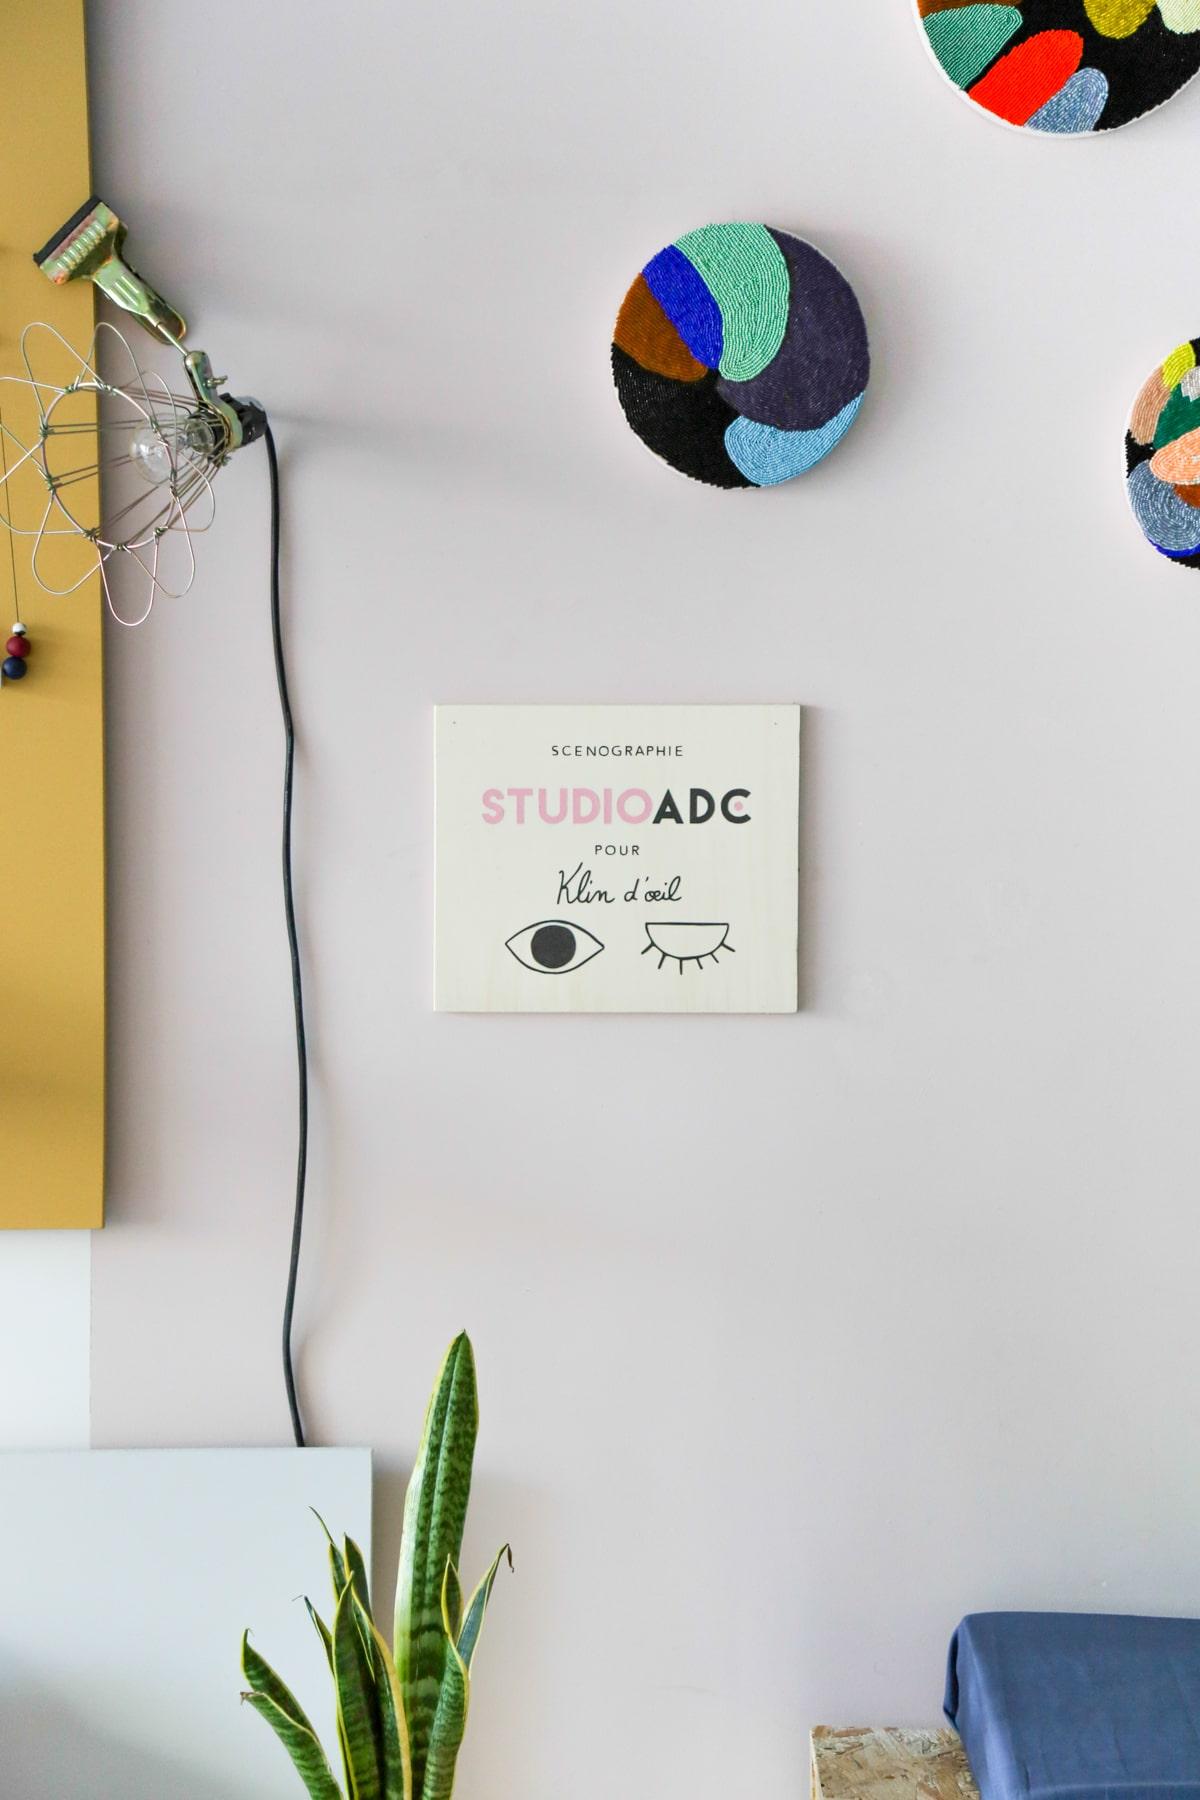 scenographie-klindoeil-popupboutique-studioadc-10